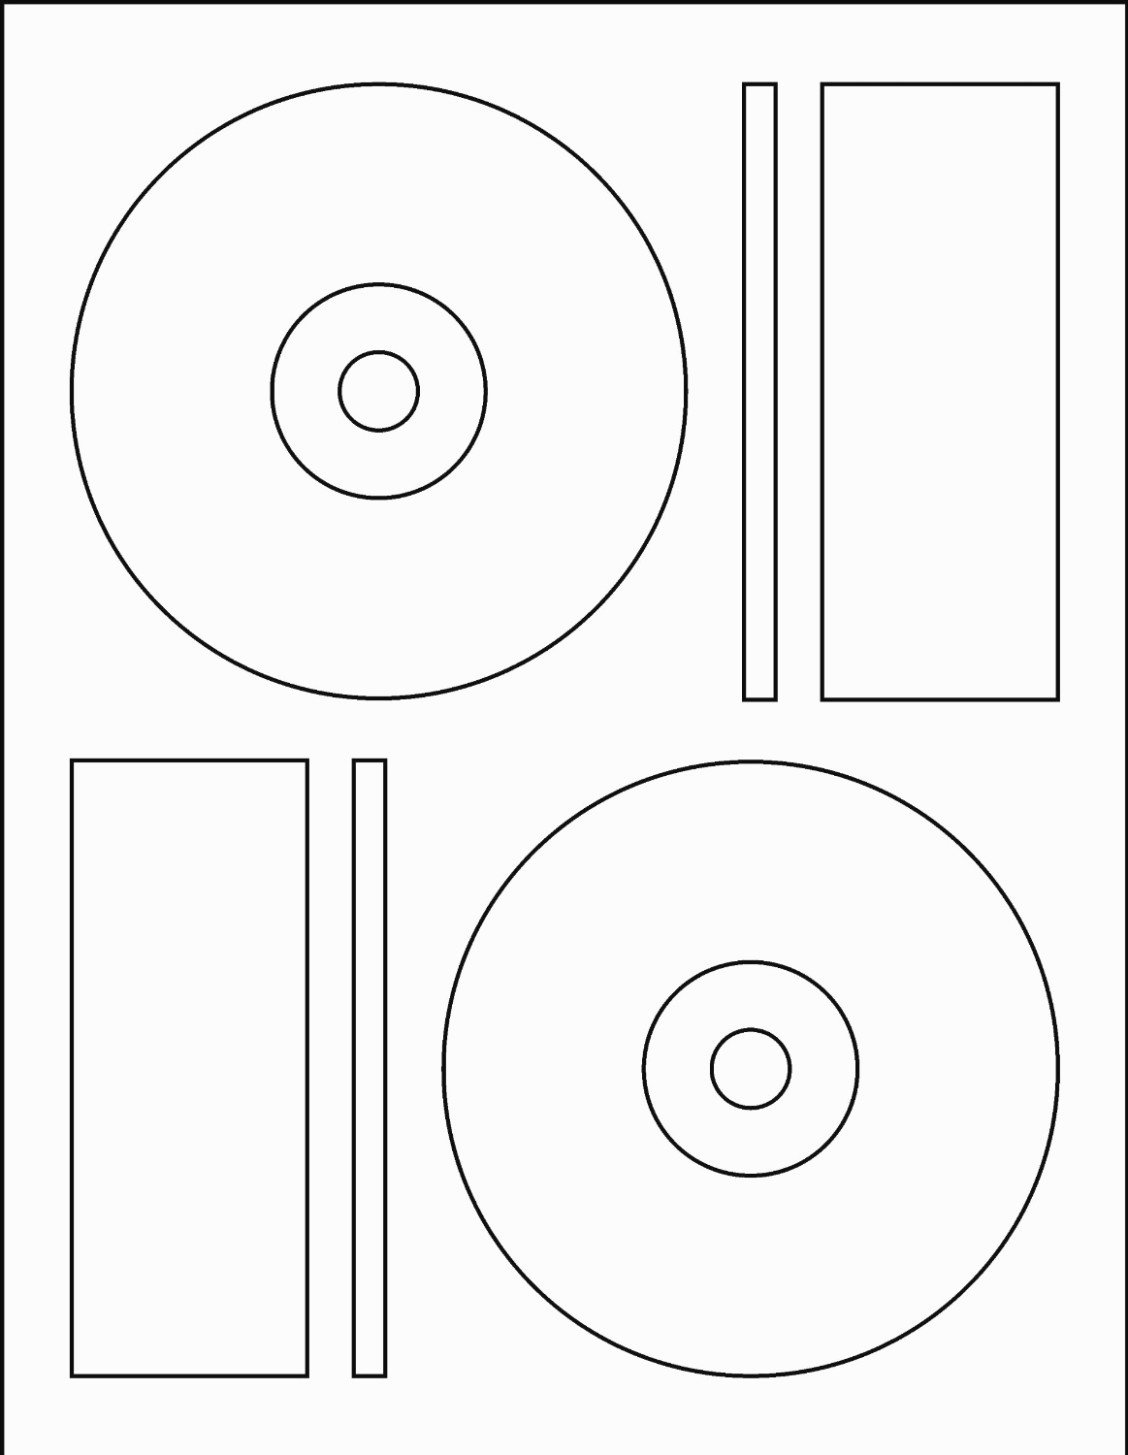 Memorex Cd Labels Template Word Elegant 15 Easy Ways to Facilitate